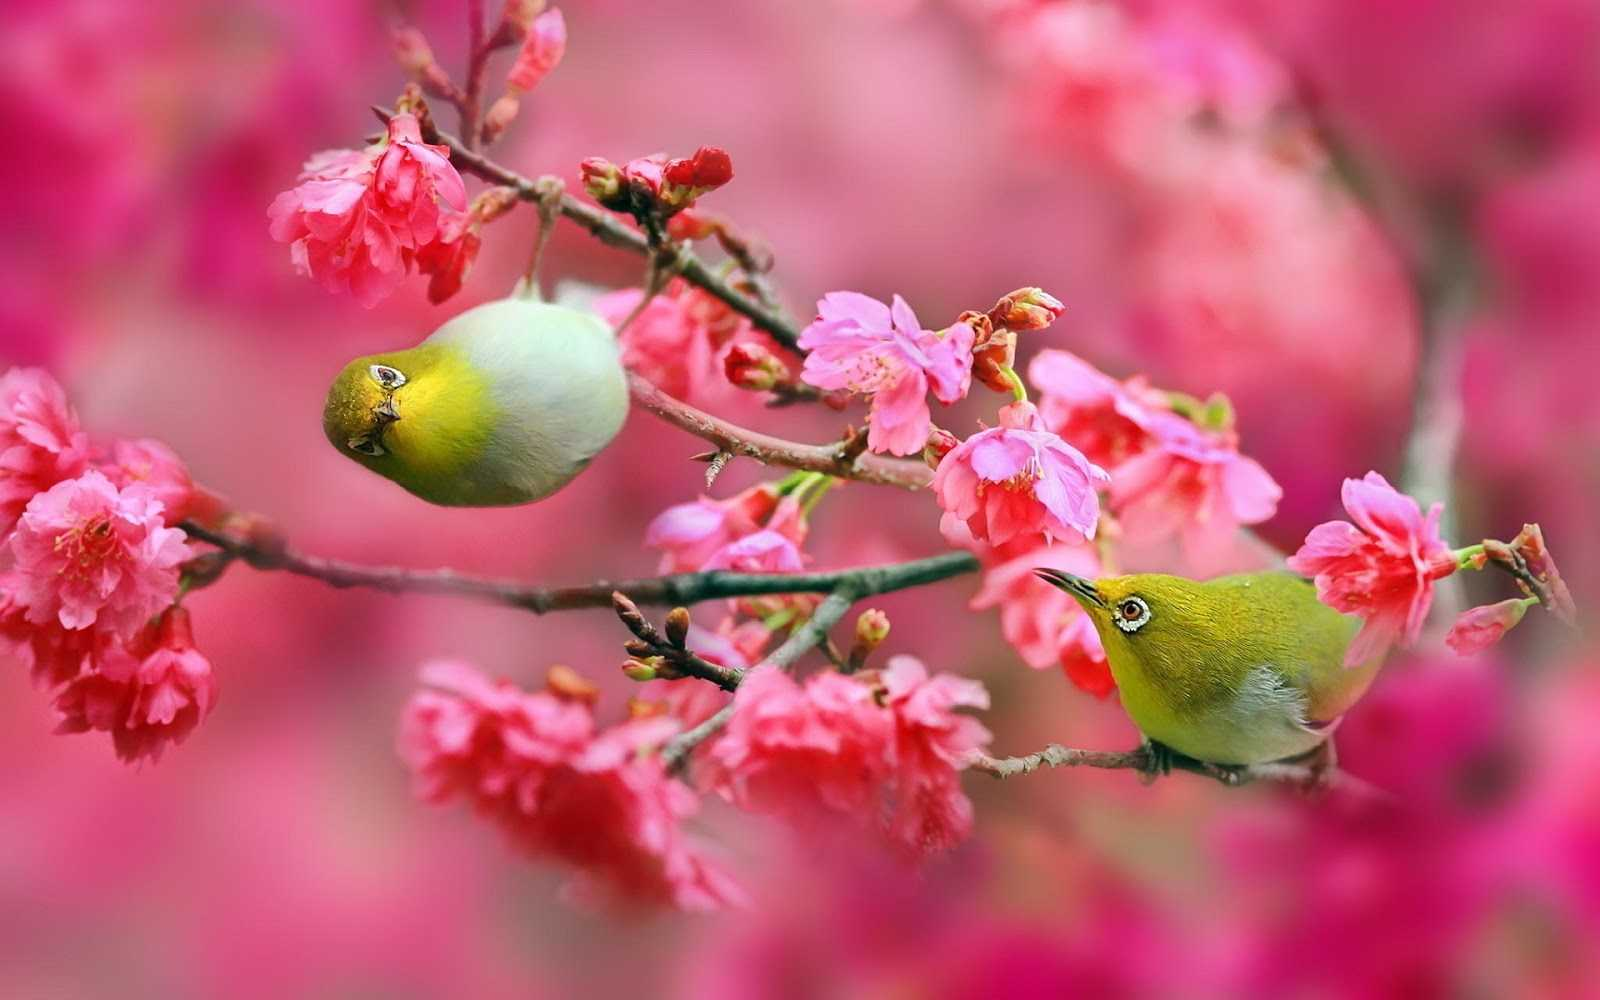 Unduh 1000+ Wallpaper Bunga Sakura Bergerak HD Paling Baru